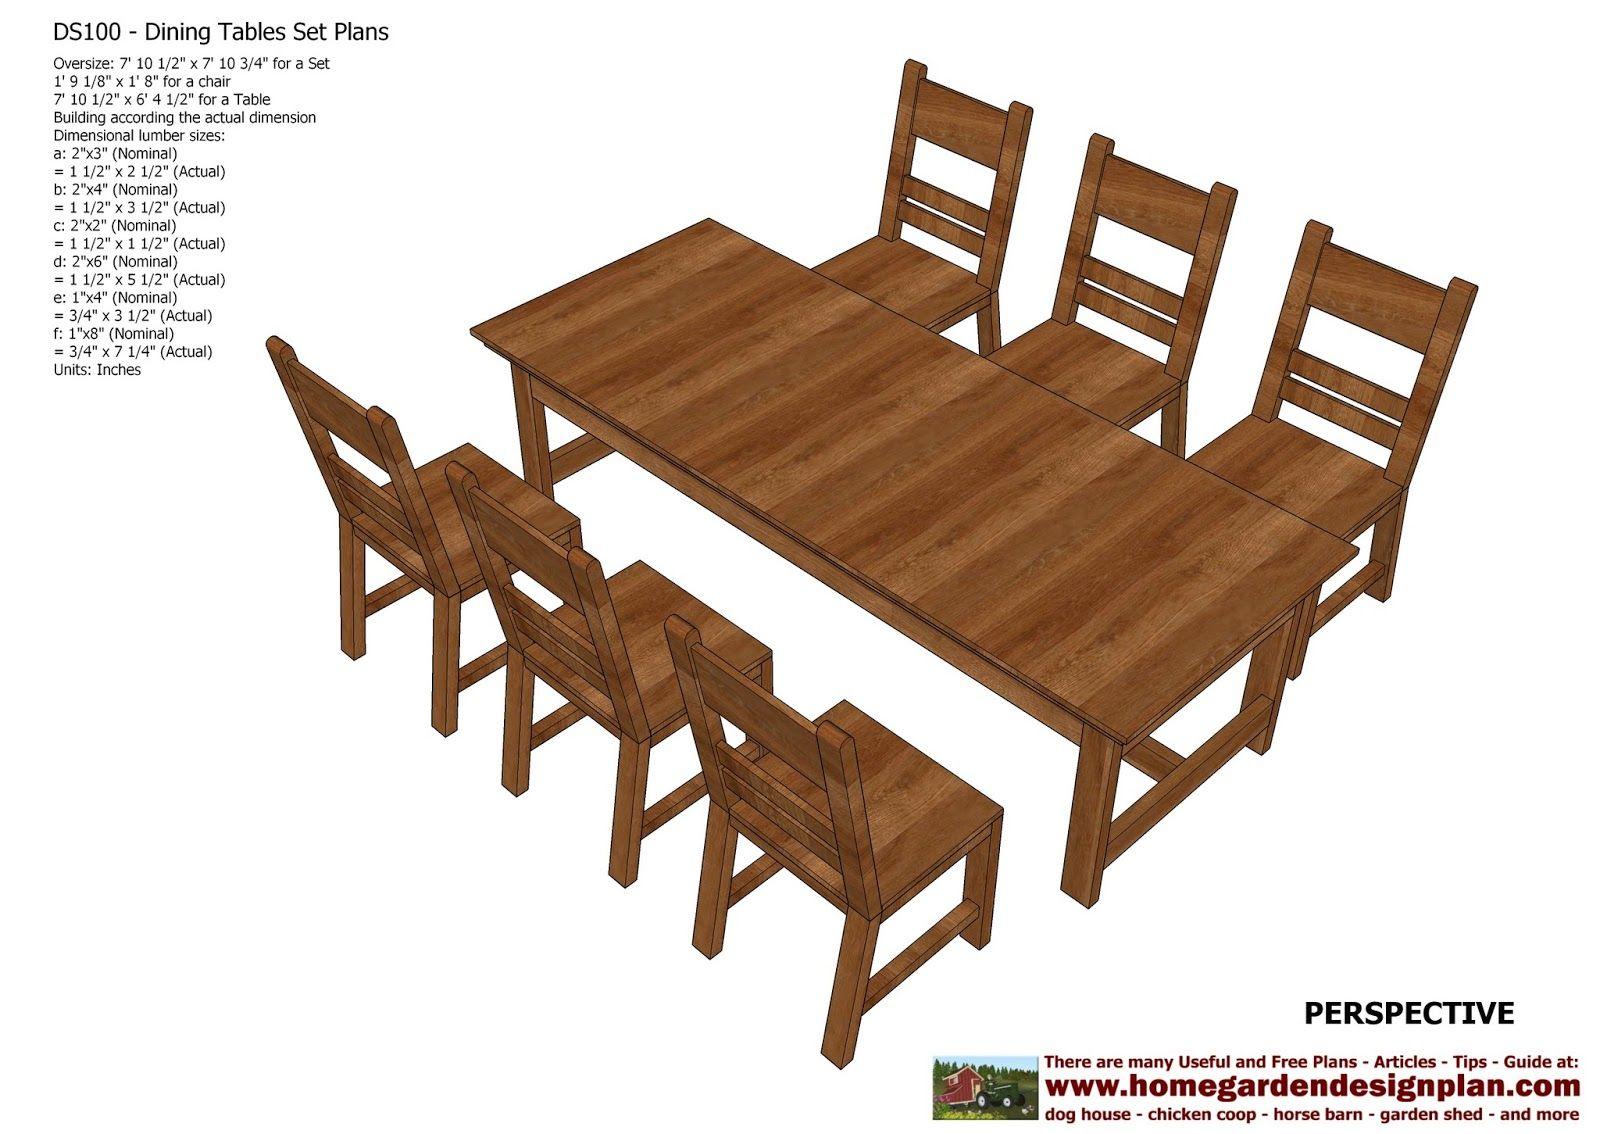 Merveilleux Home Garden Plans: DS100   Dining Table Set Plans   Woodworking Plans    Outdooru2026